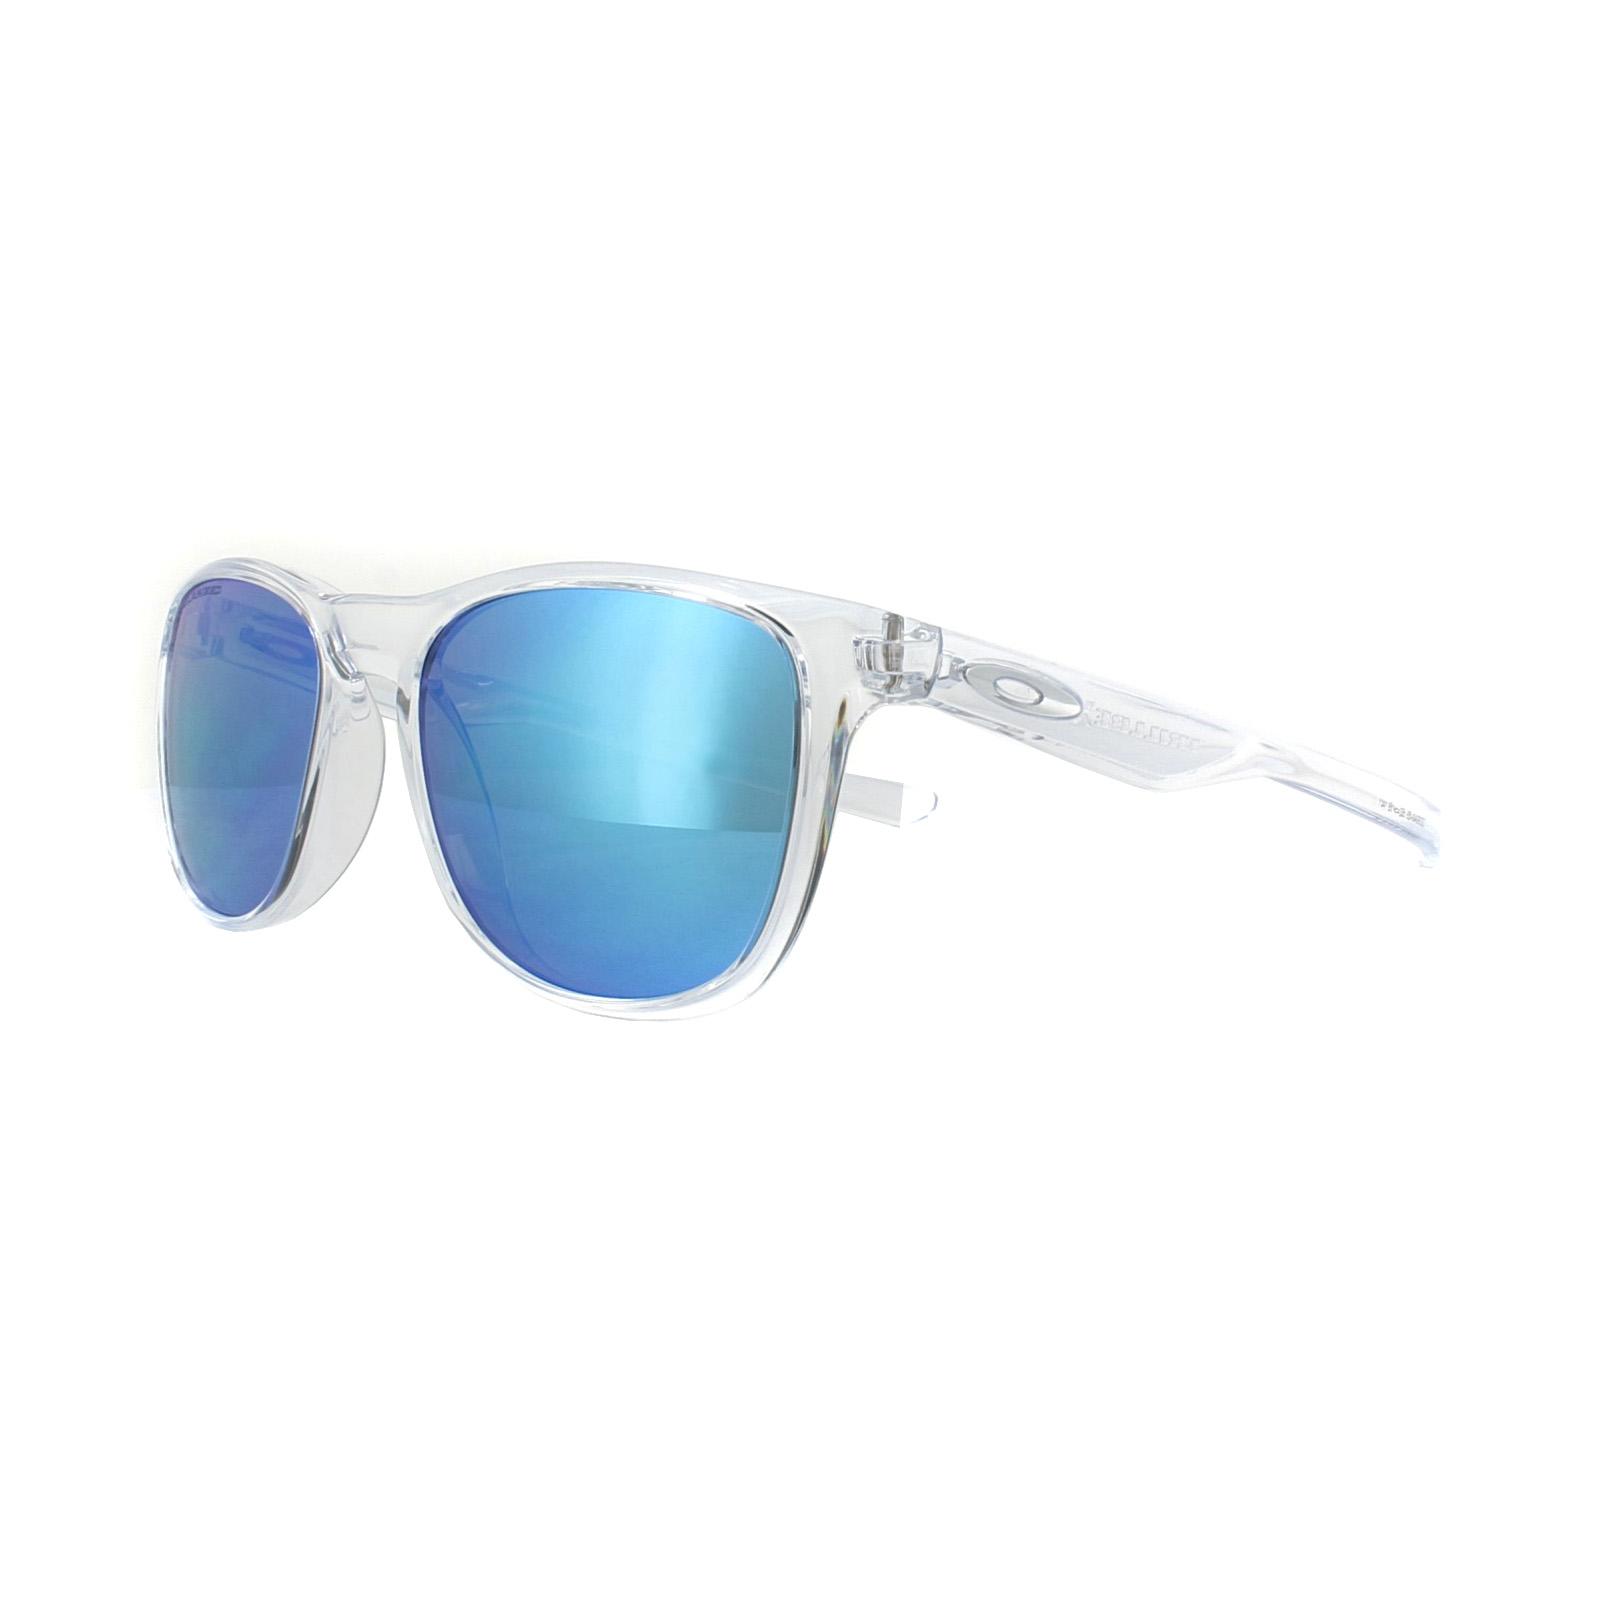 Oakley Gafas de sol trillbe x oo9340-05 Pulido Claro ZAFIRO Iridio ...